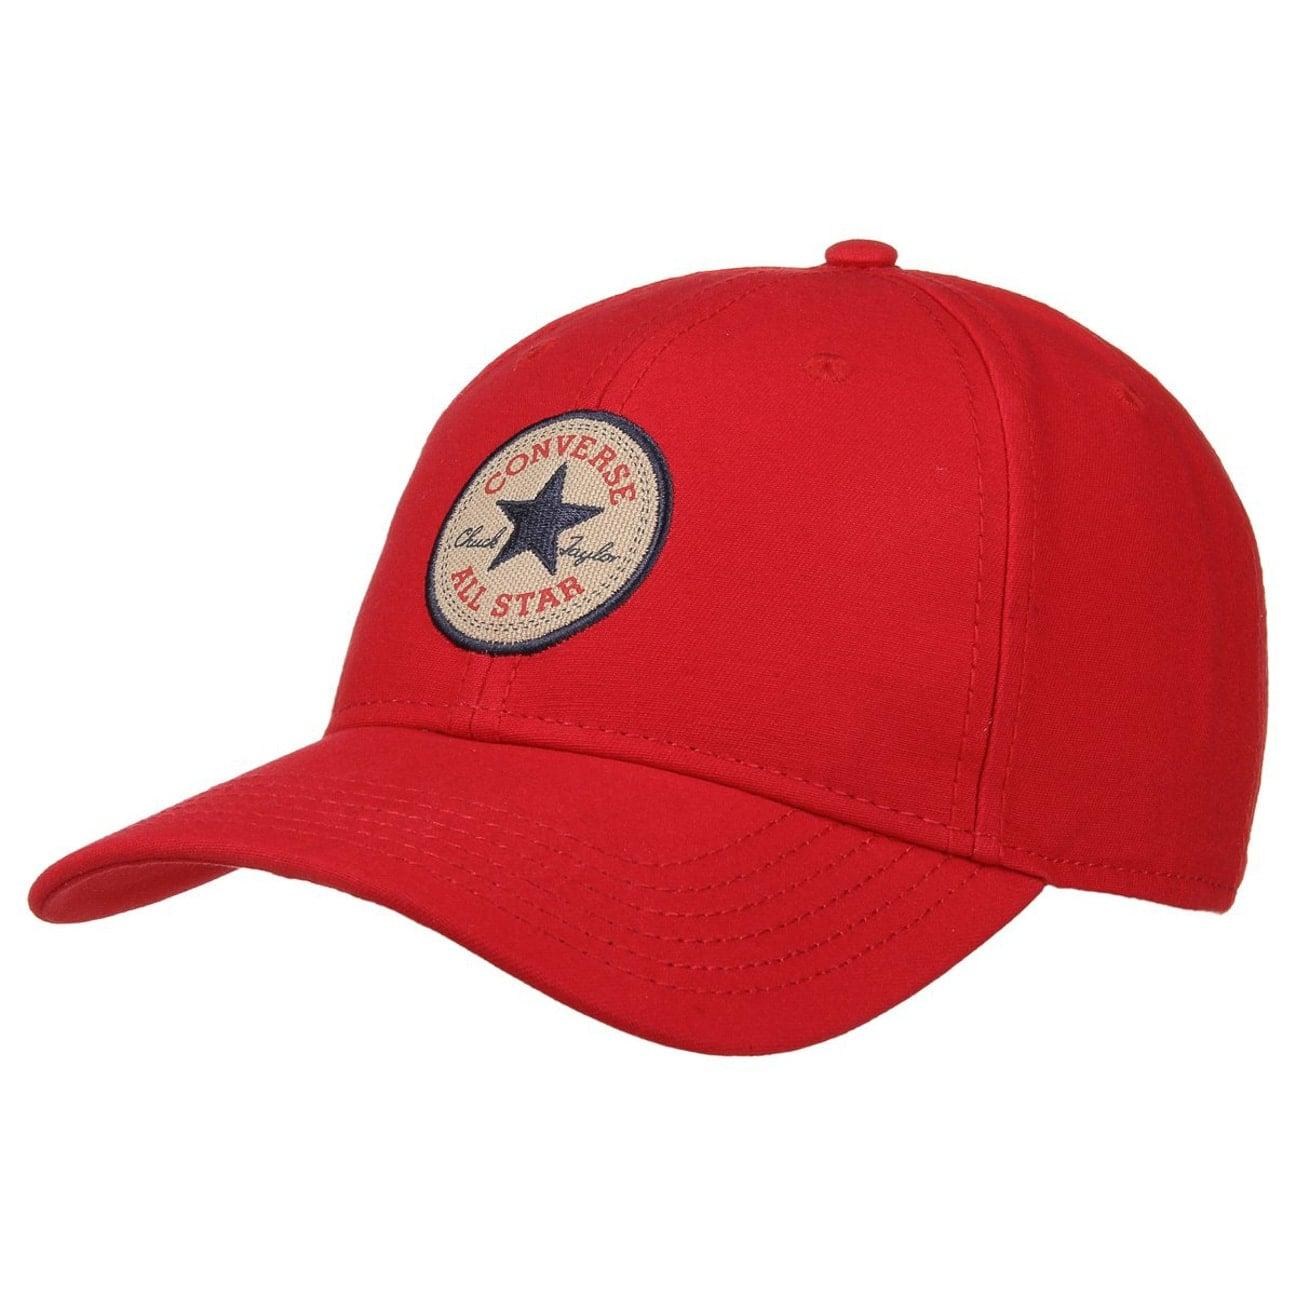 c1771cf3c15 ... bordeaux 5 · Core Classic Baseball Cap by Converse - red 4 ...